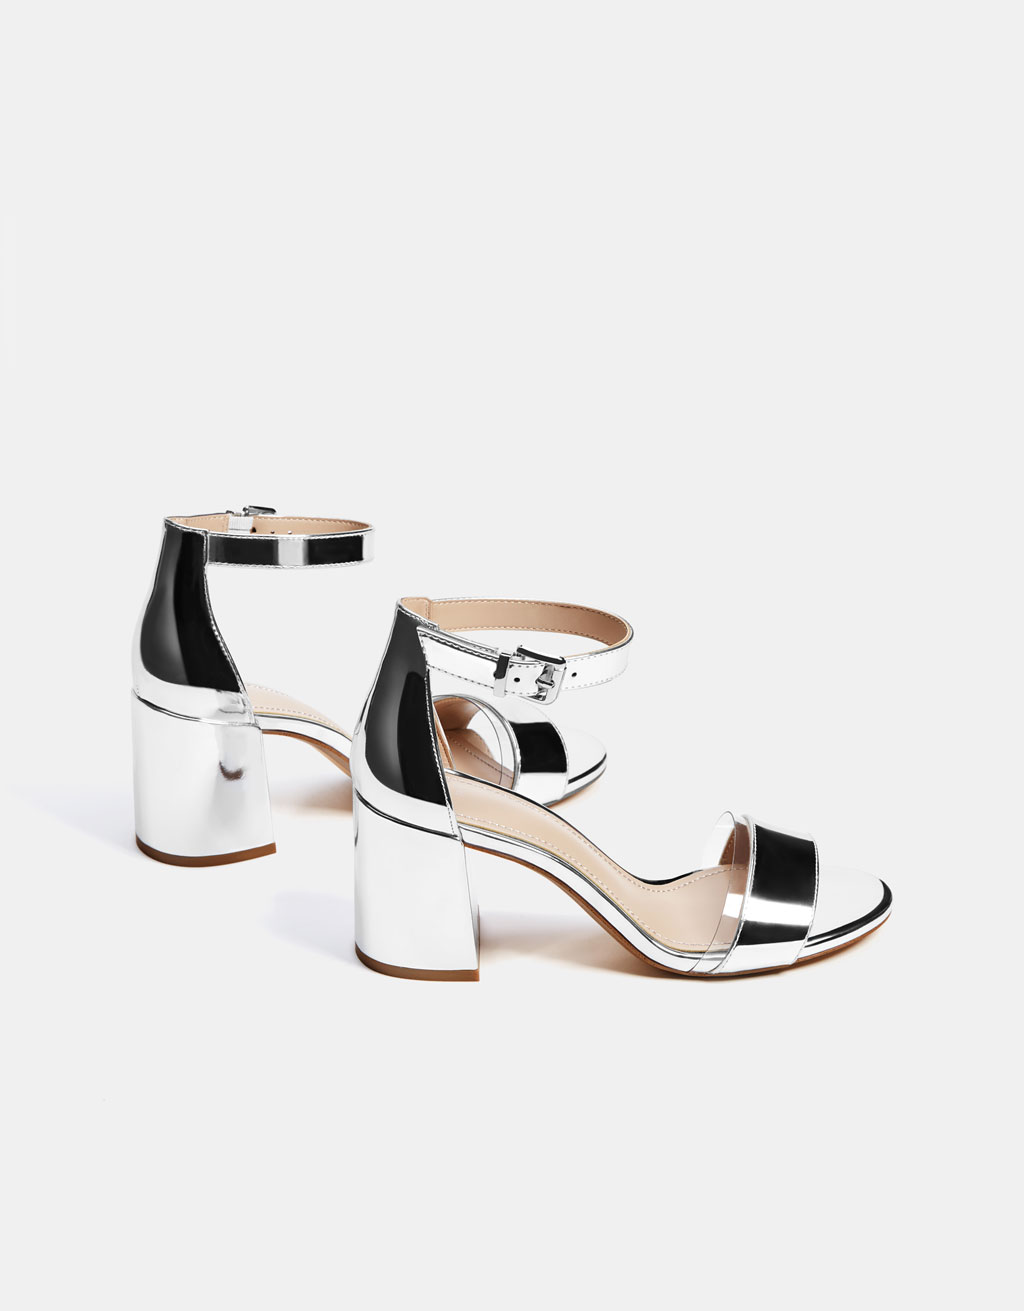 a0d5ab4a189 Metallic vinyl high-heel sandals - SHOES - Bershka Ireland